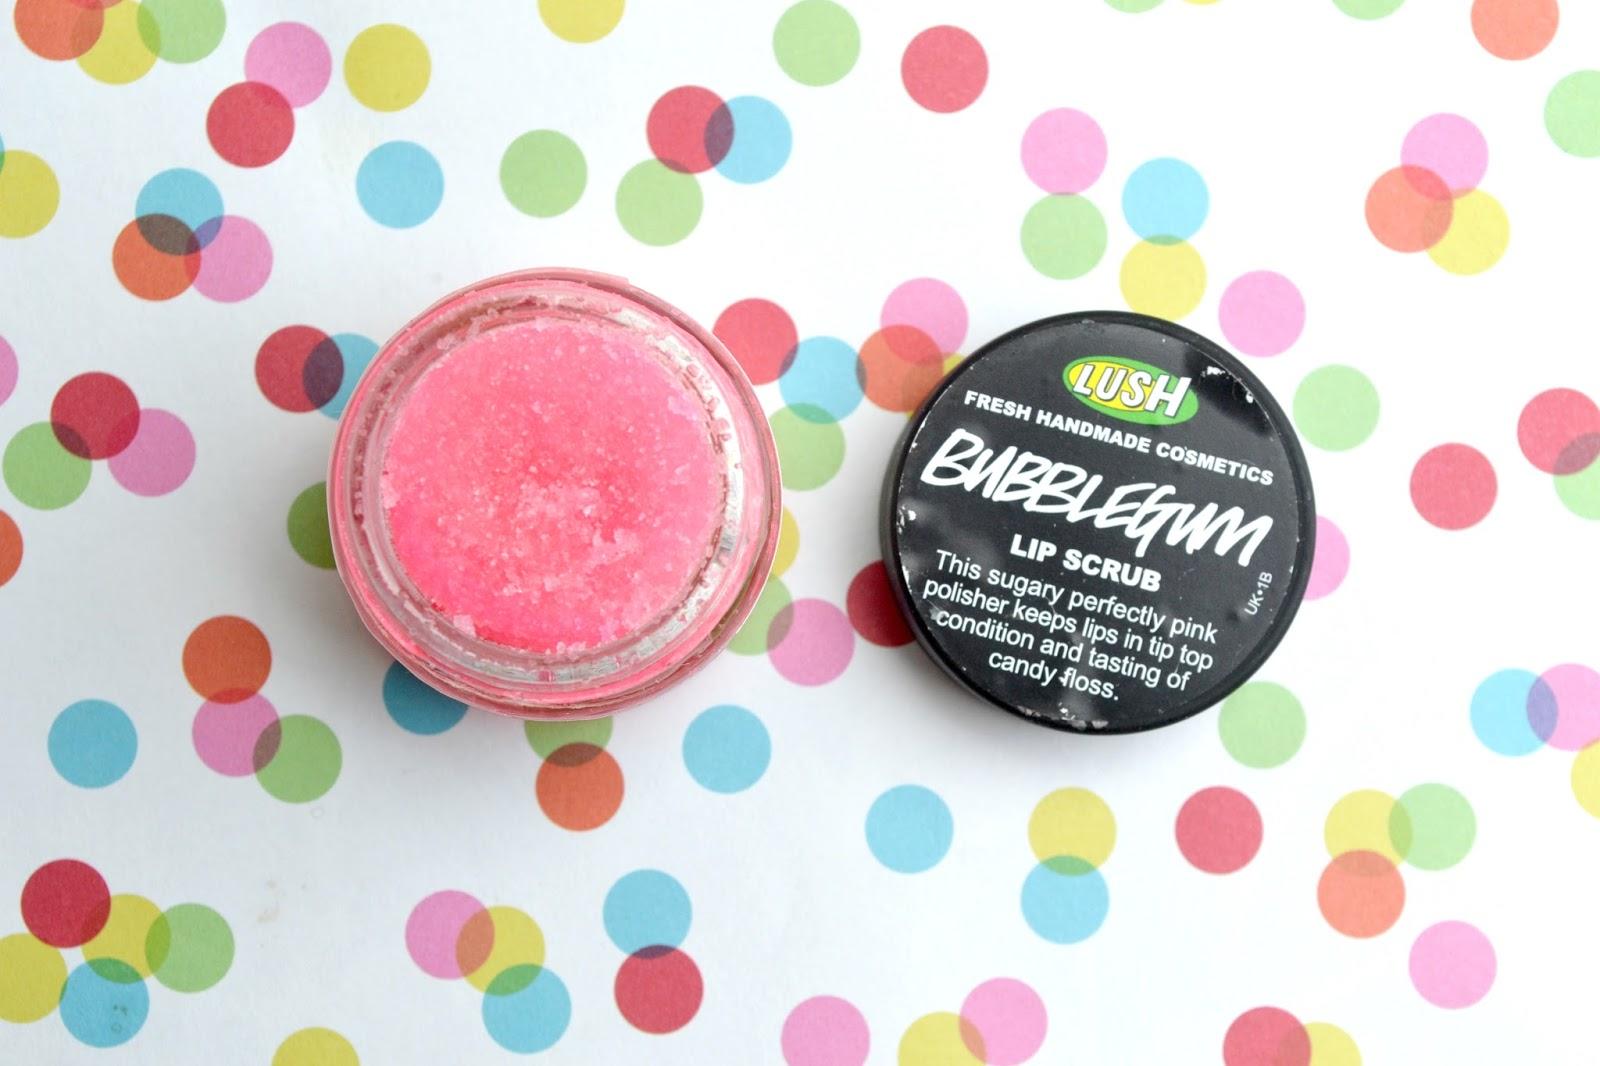 Lush: Bubblegum lip scrub